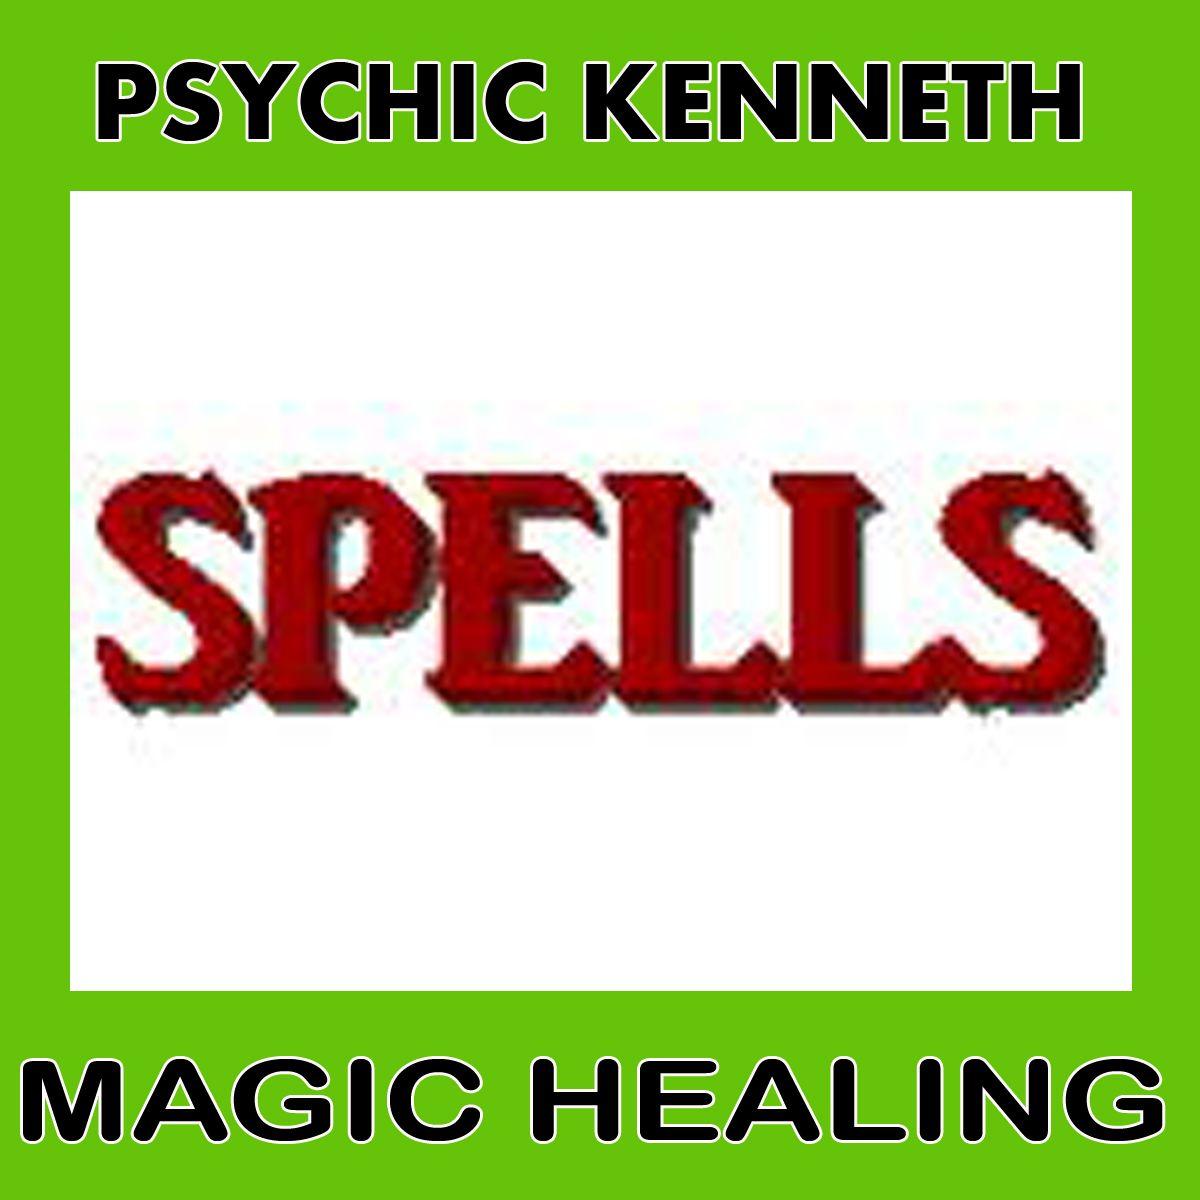 Love Healing Spells | How to get Psychic love online | Call | WhatsApp: +27843769238